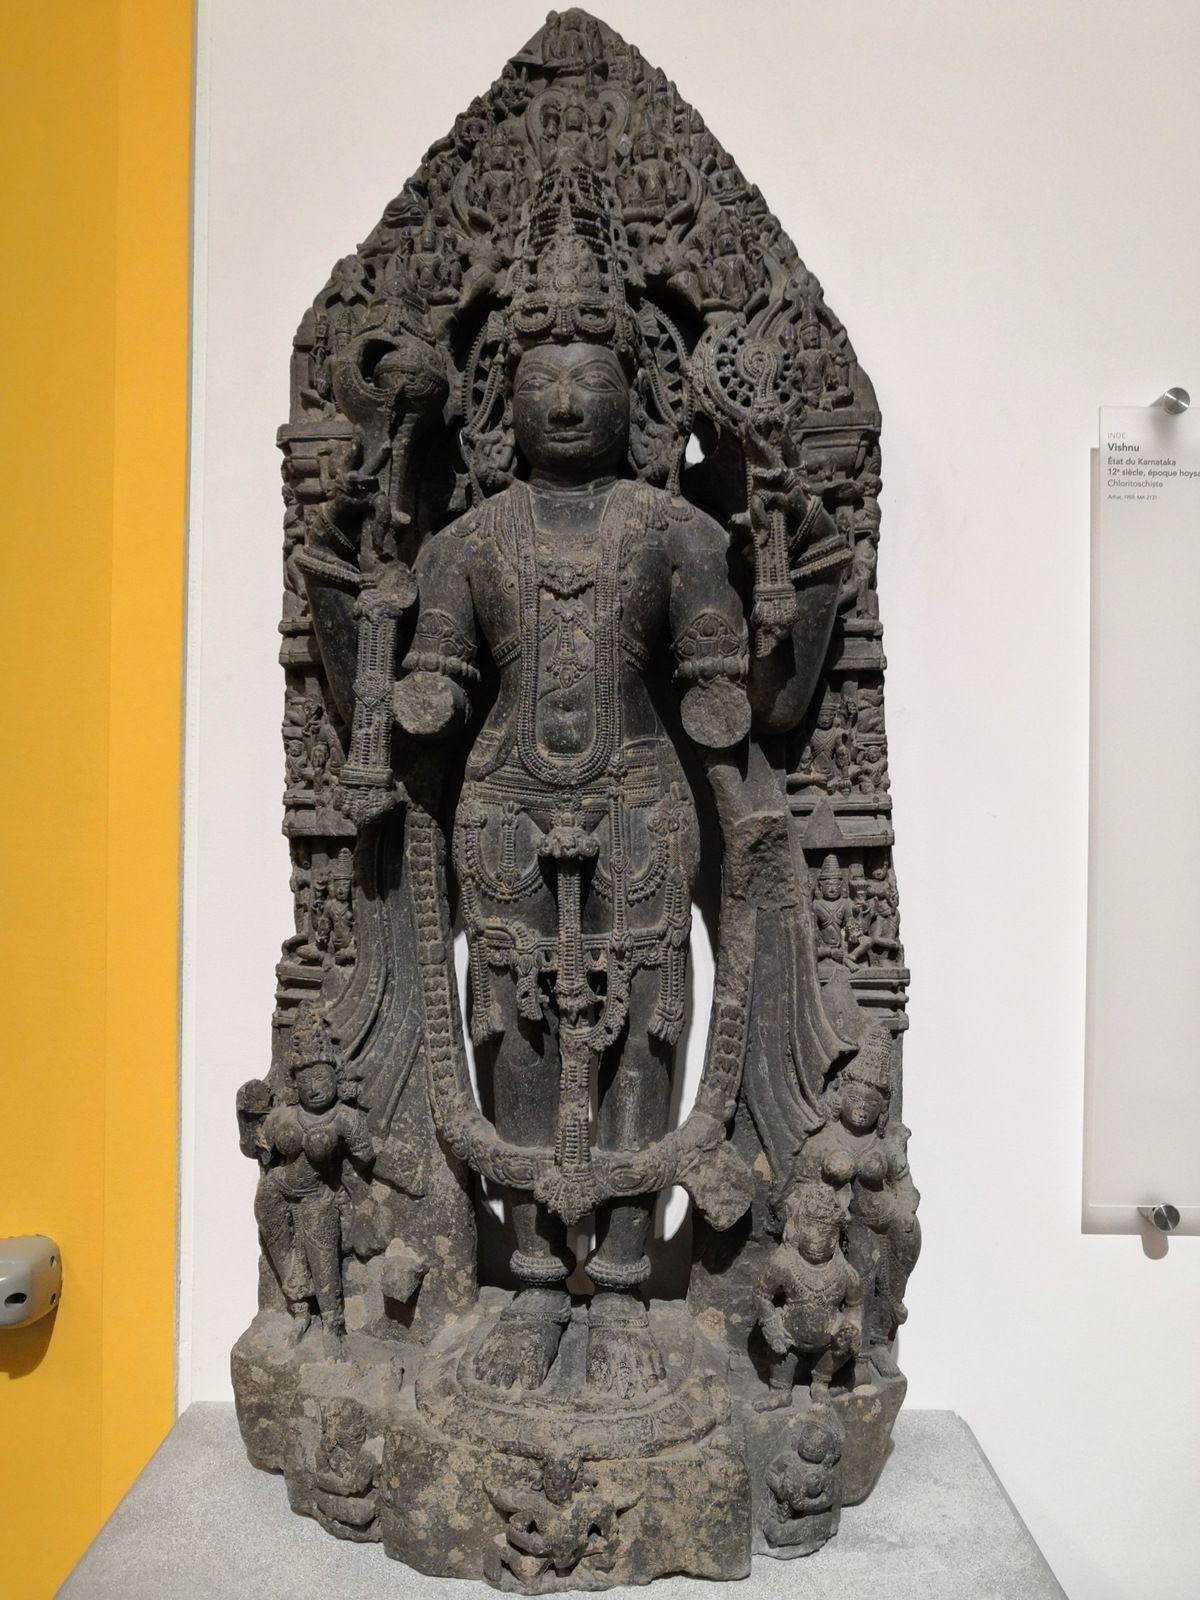 Vishnu, Etat du Karnataka (Inde), 12e siècle, époque hoysala, Chloritoschiste